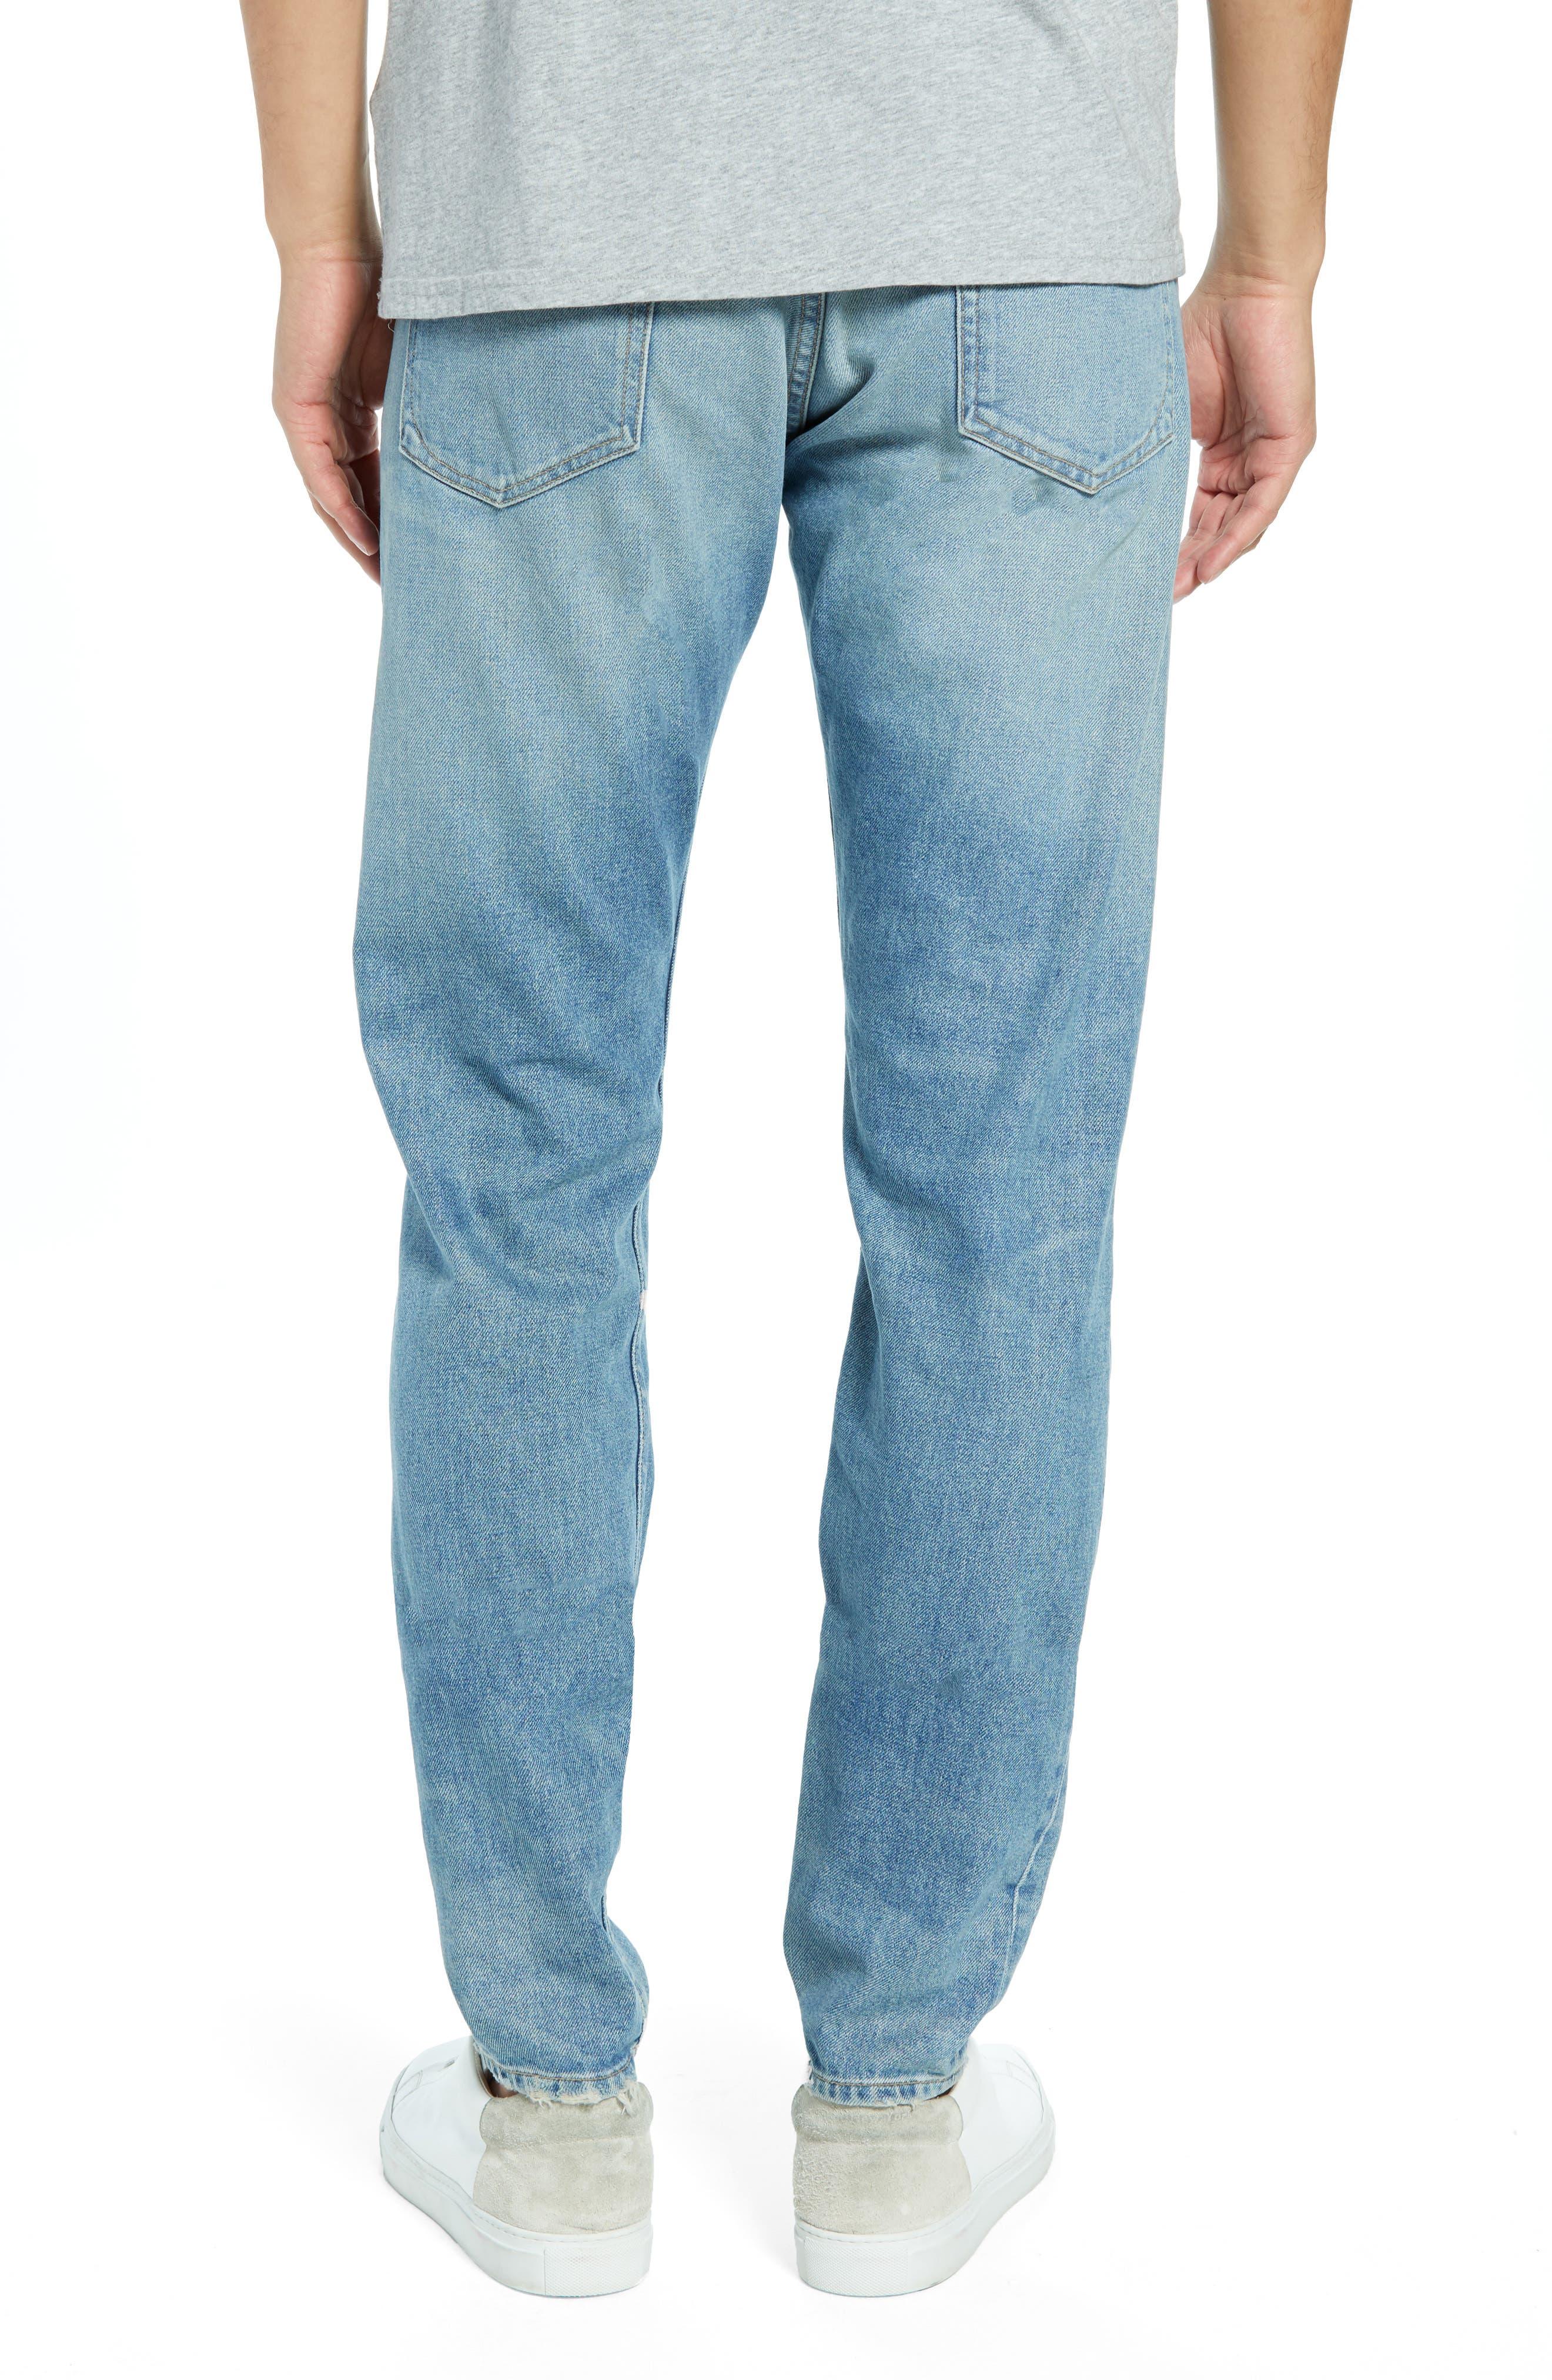 Fit 1 Skinny Fit Jeans,                             Alternate thumbnail 2, color,                             JAMIE